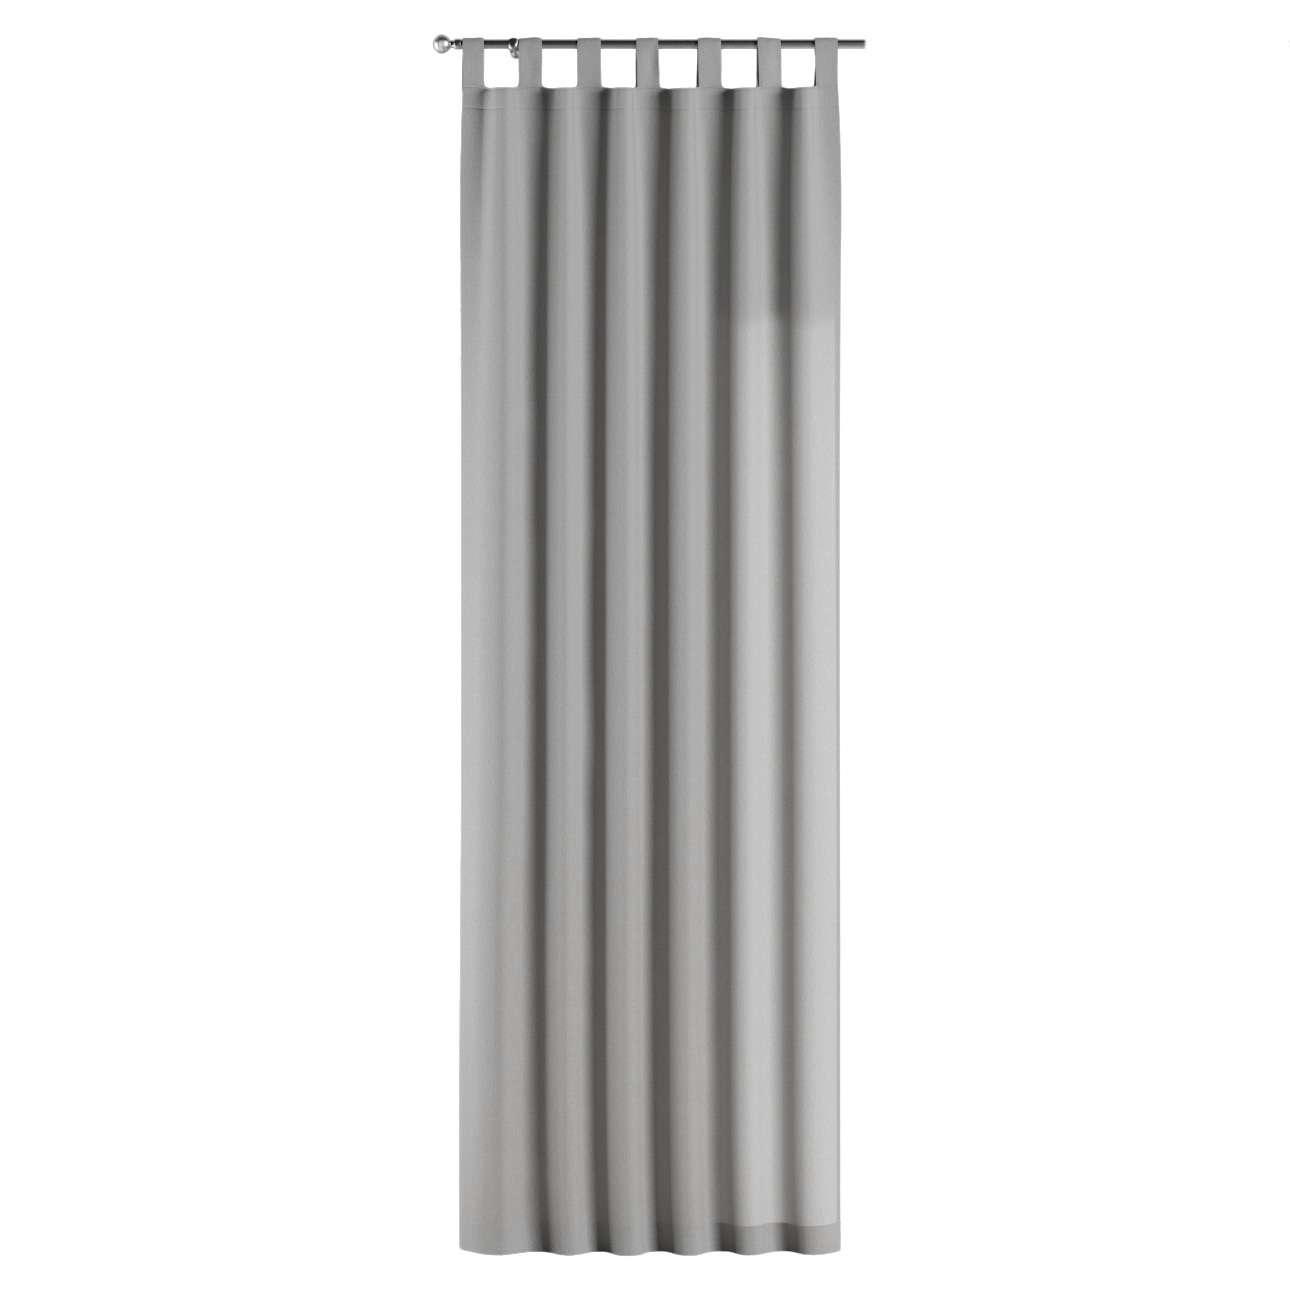 Zasłona na szelkach 1 szt. 1szt 130x260 cm w kolekcji Chenille, tkanina: 702-23